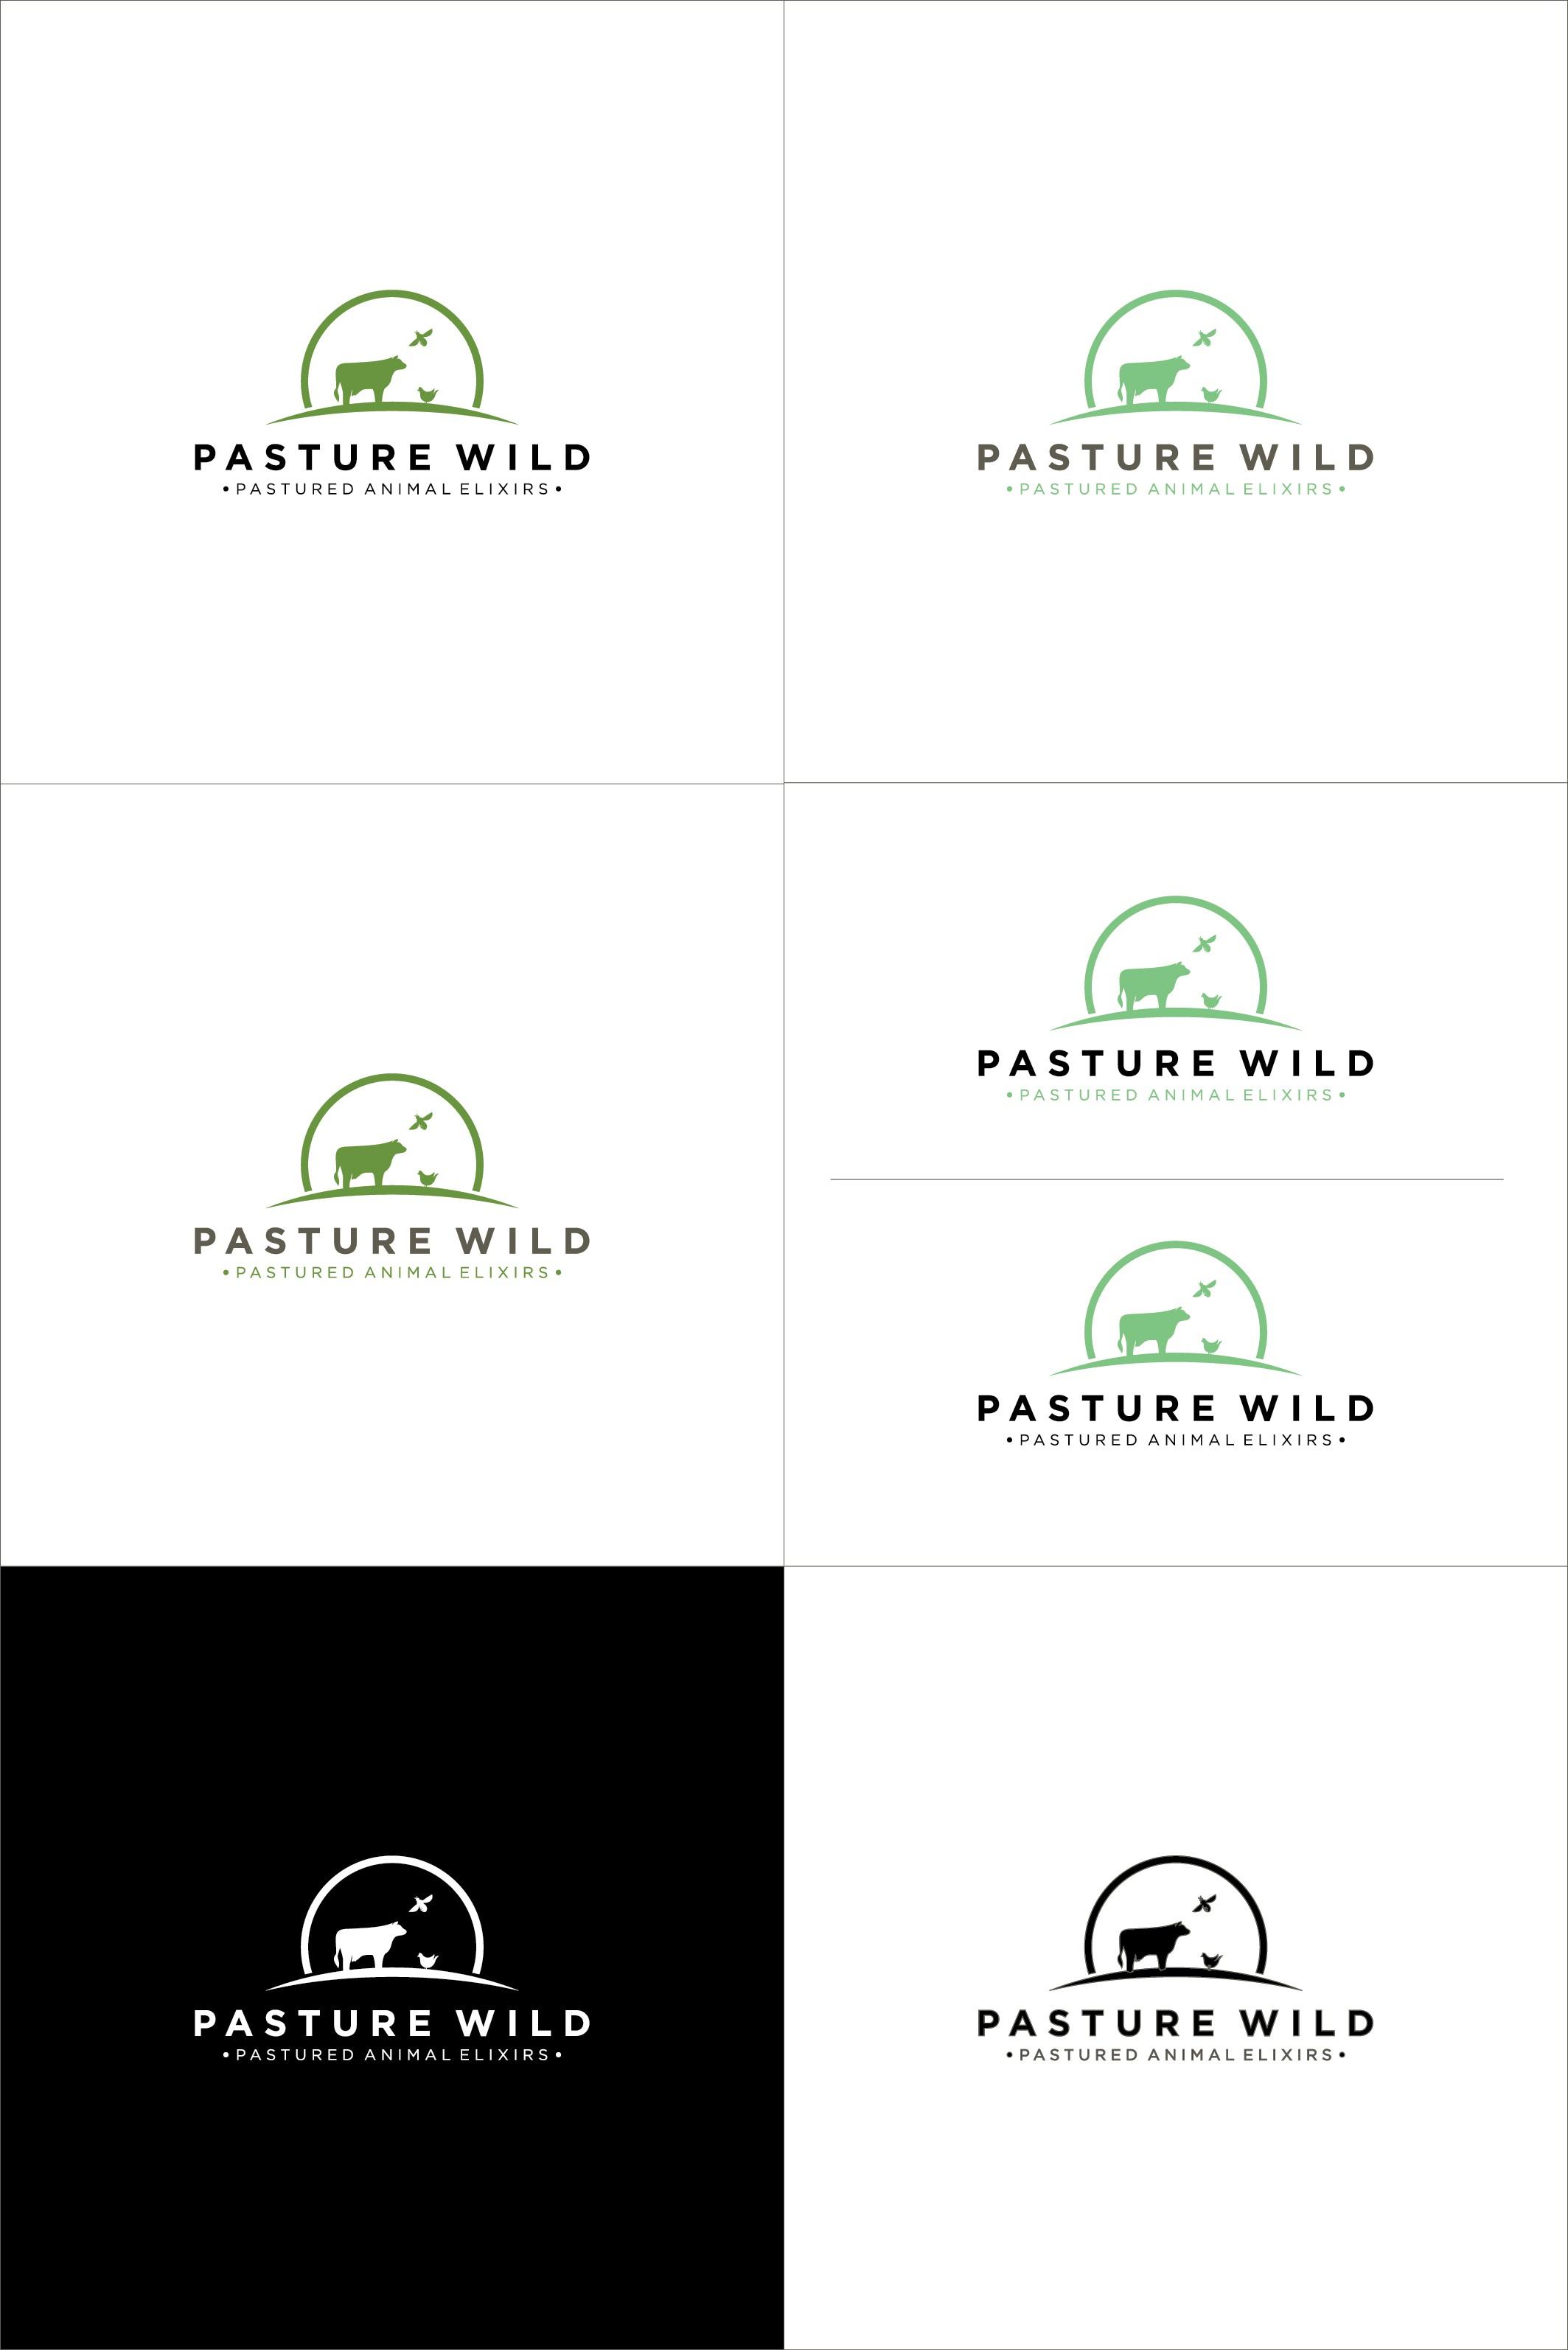 Create a Modern Clean Logo for Pasture Wild